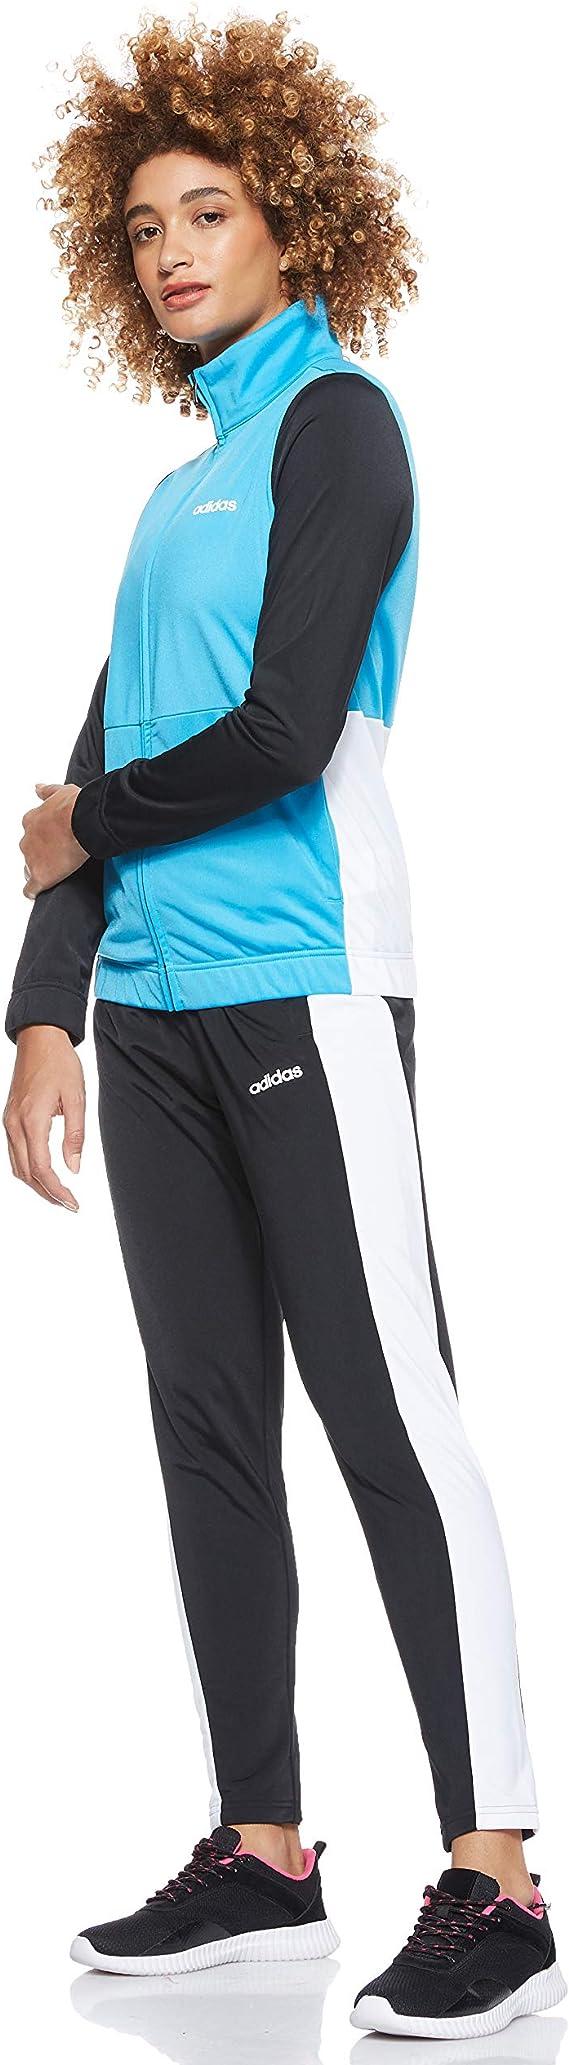 adidas WTS Plain Tric Chándal, Mujer: Amazon.es: Ropa y accesorios